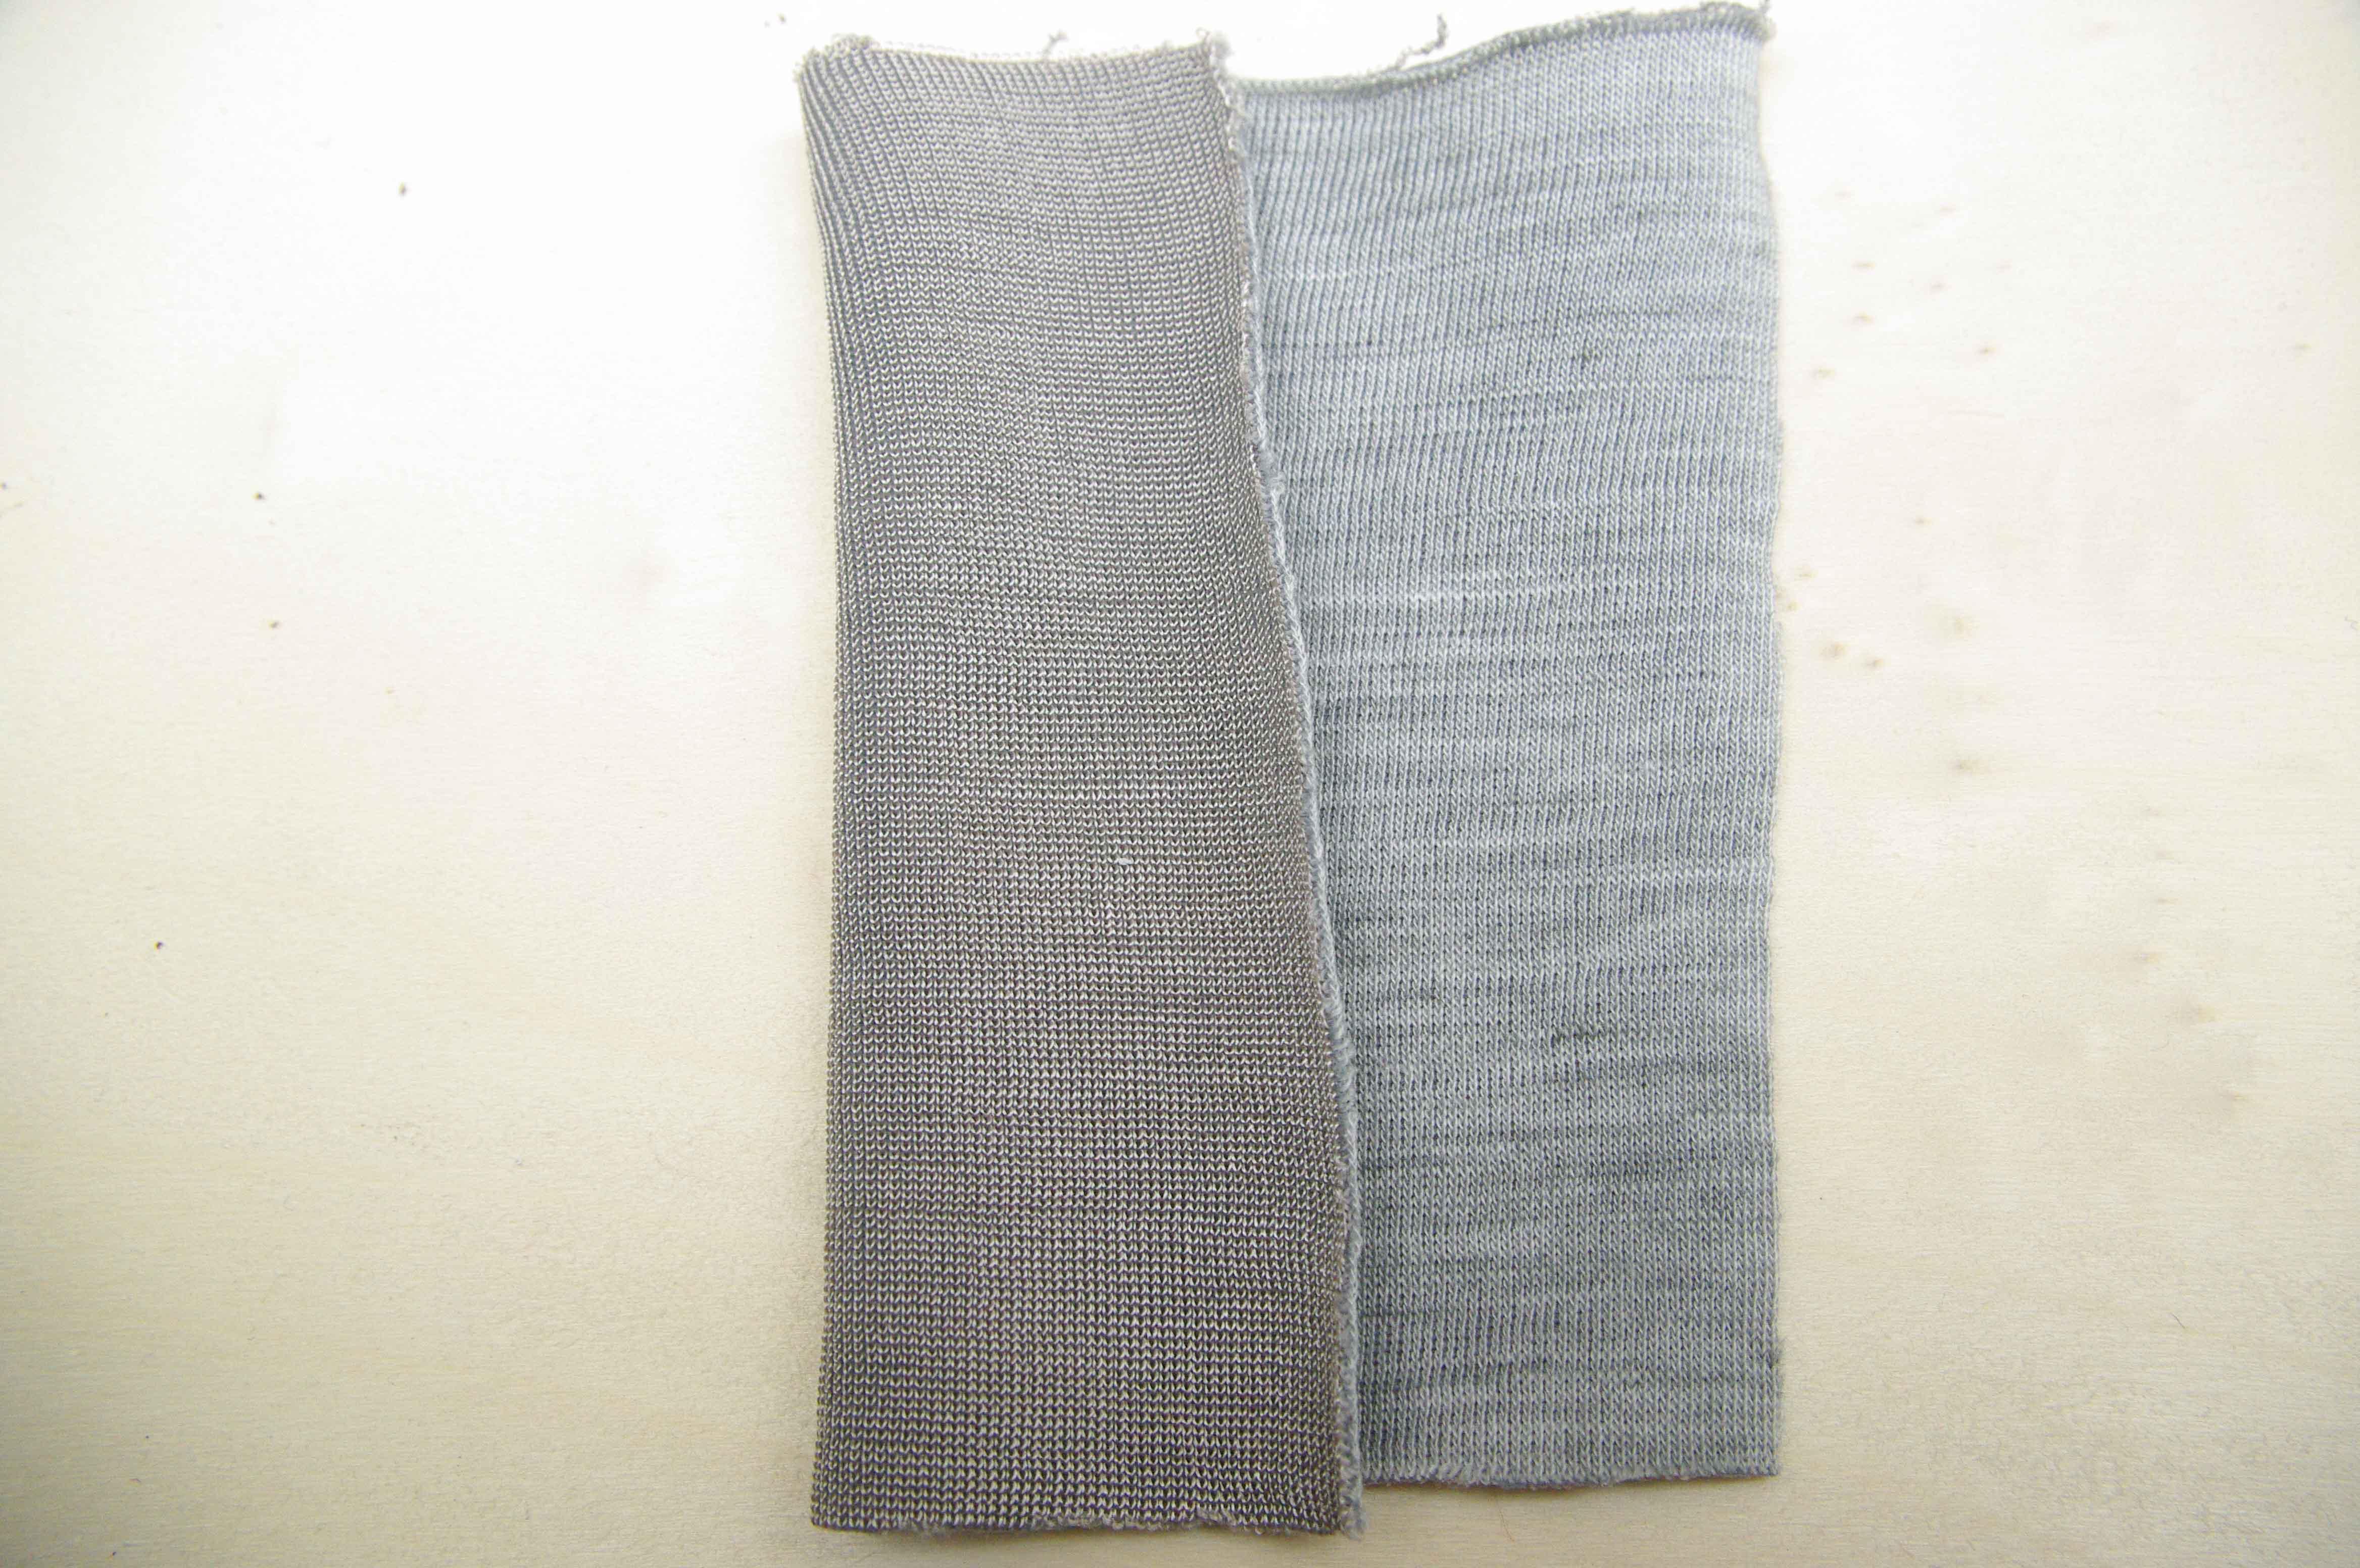 resistive_knitting_1